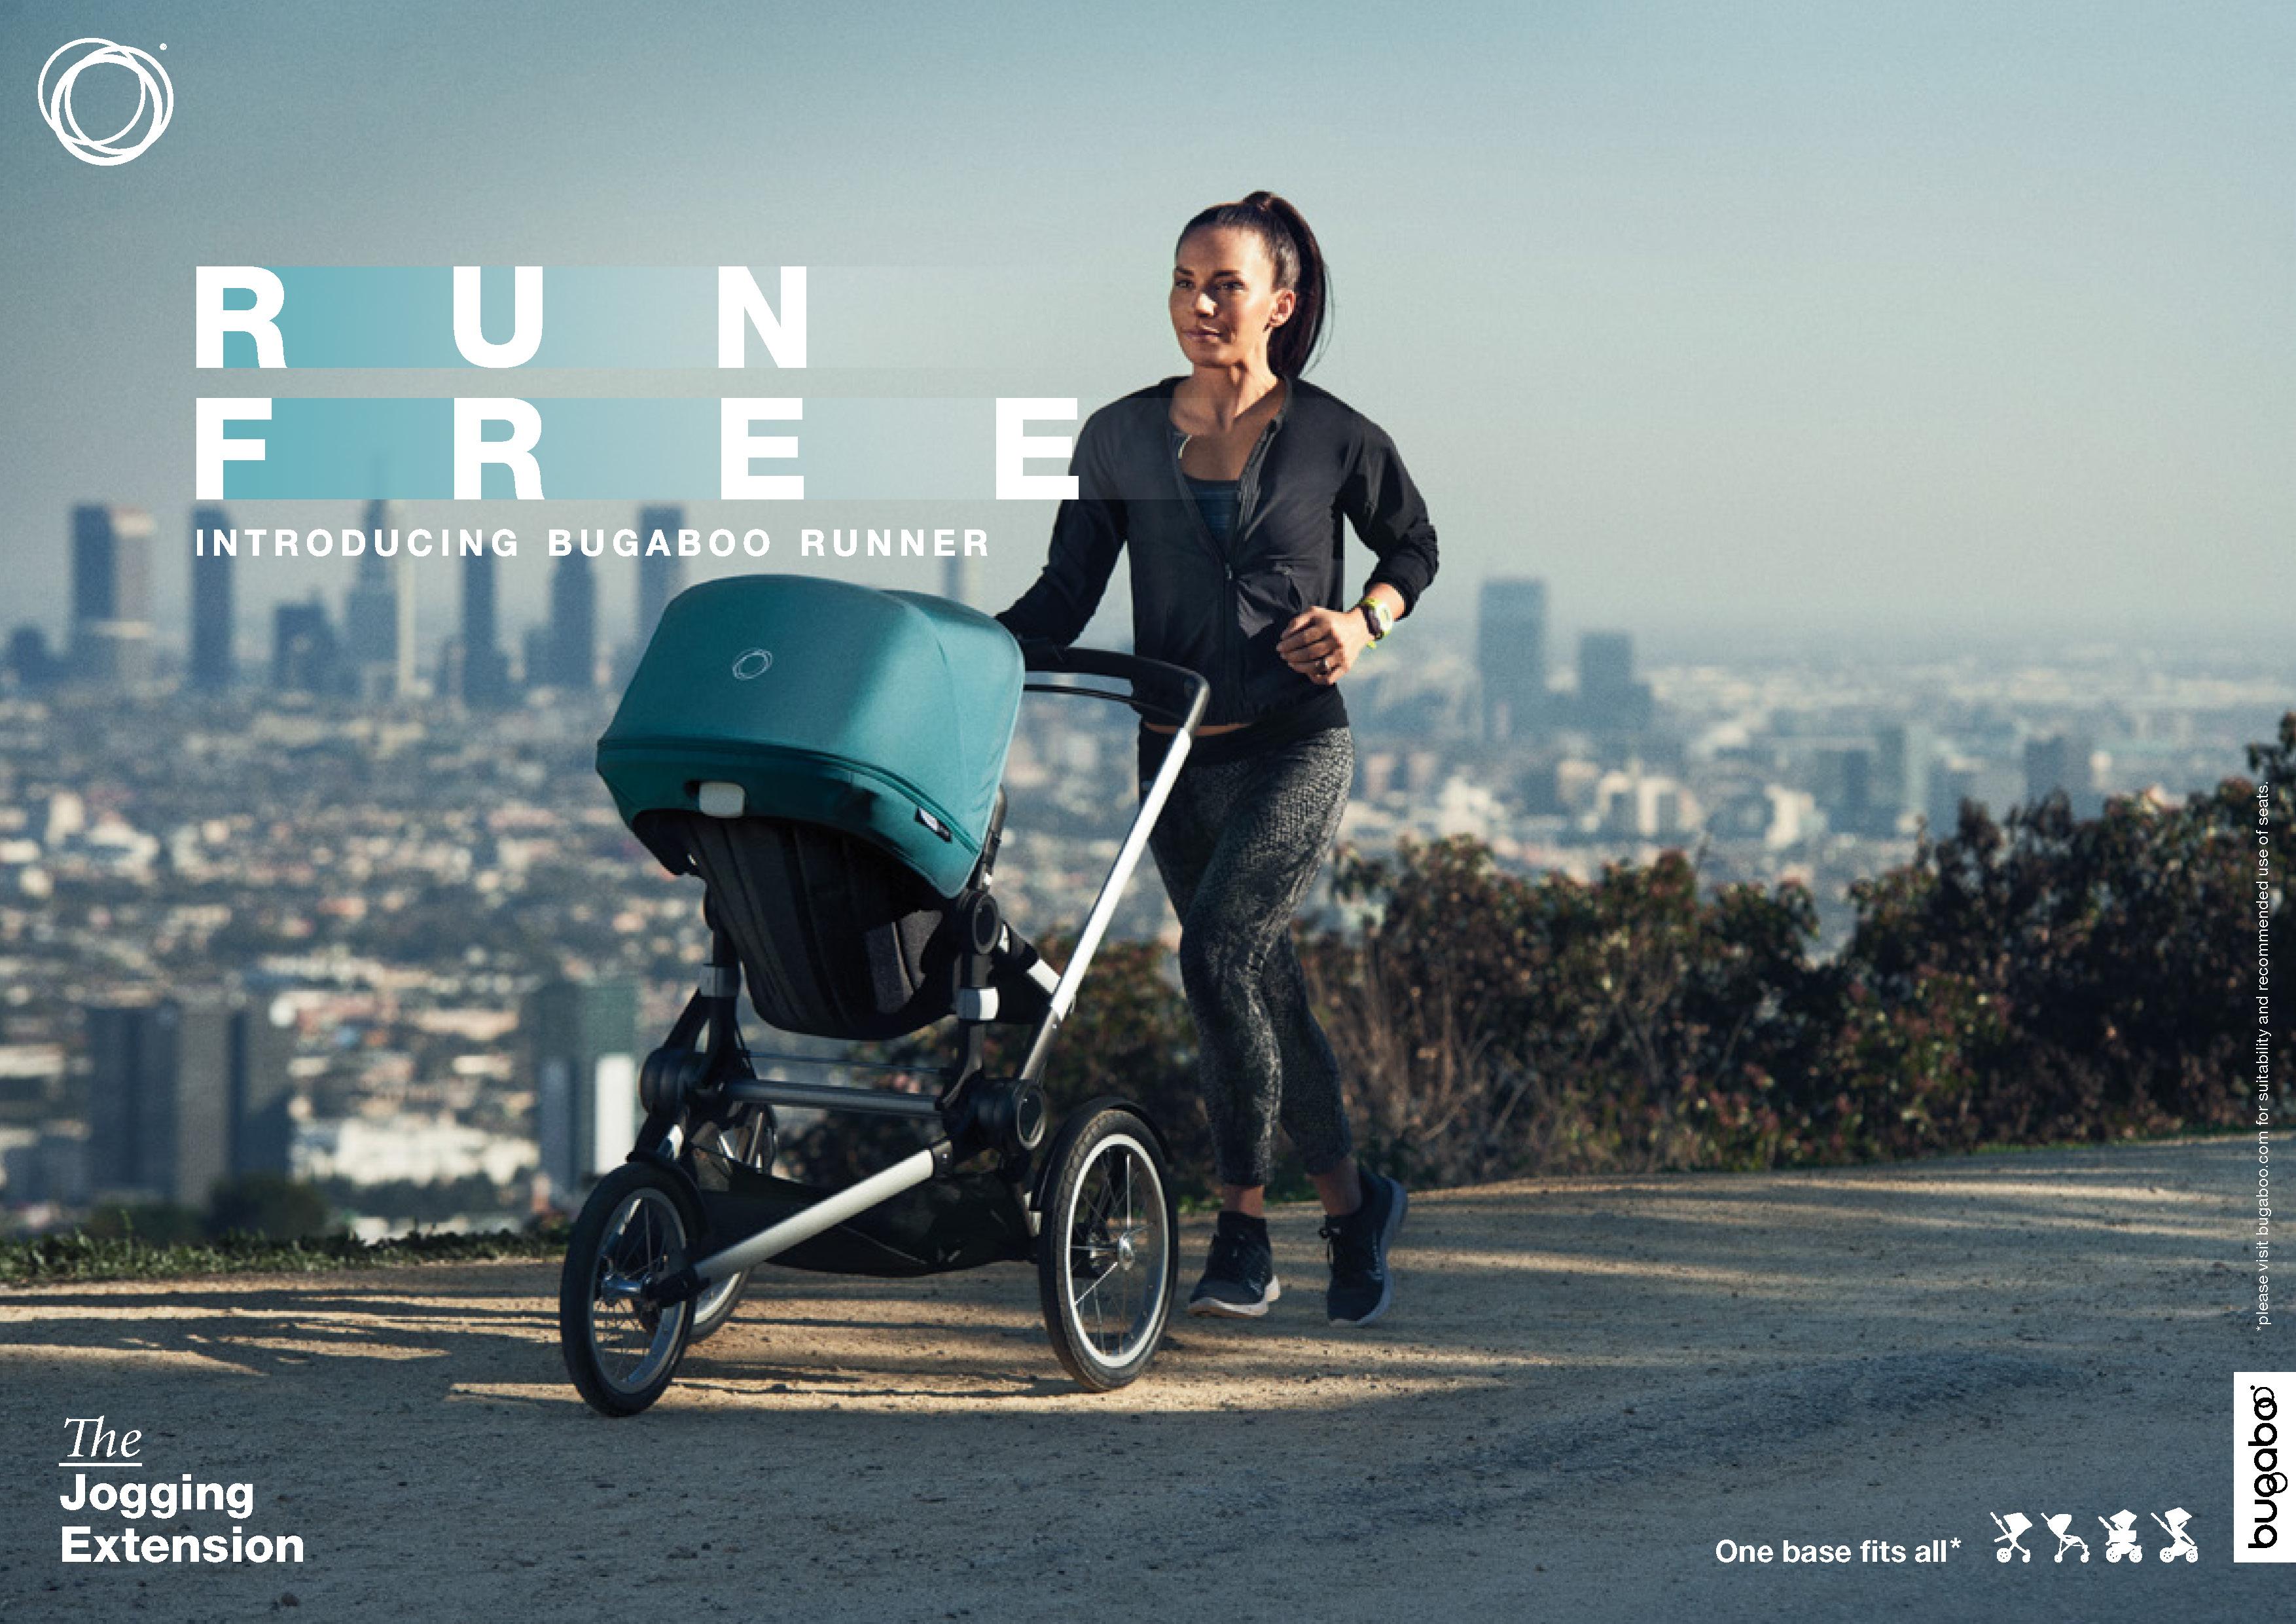 Bugaboo-Bugaboo Runner-GoodGirlsCompany-kinderwagen geschikt voro hardlopen-hardlopen met je kindje